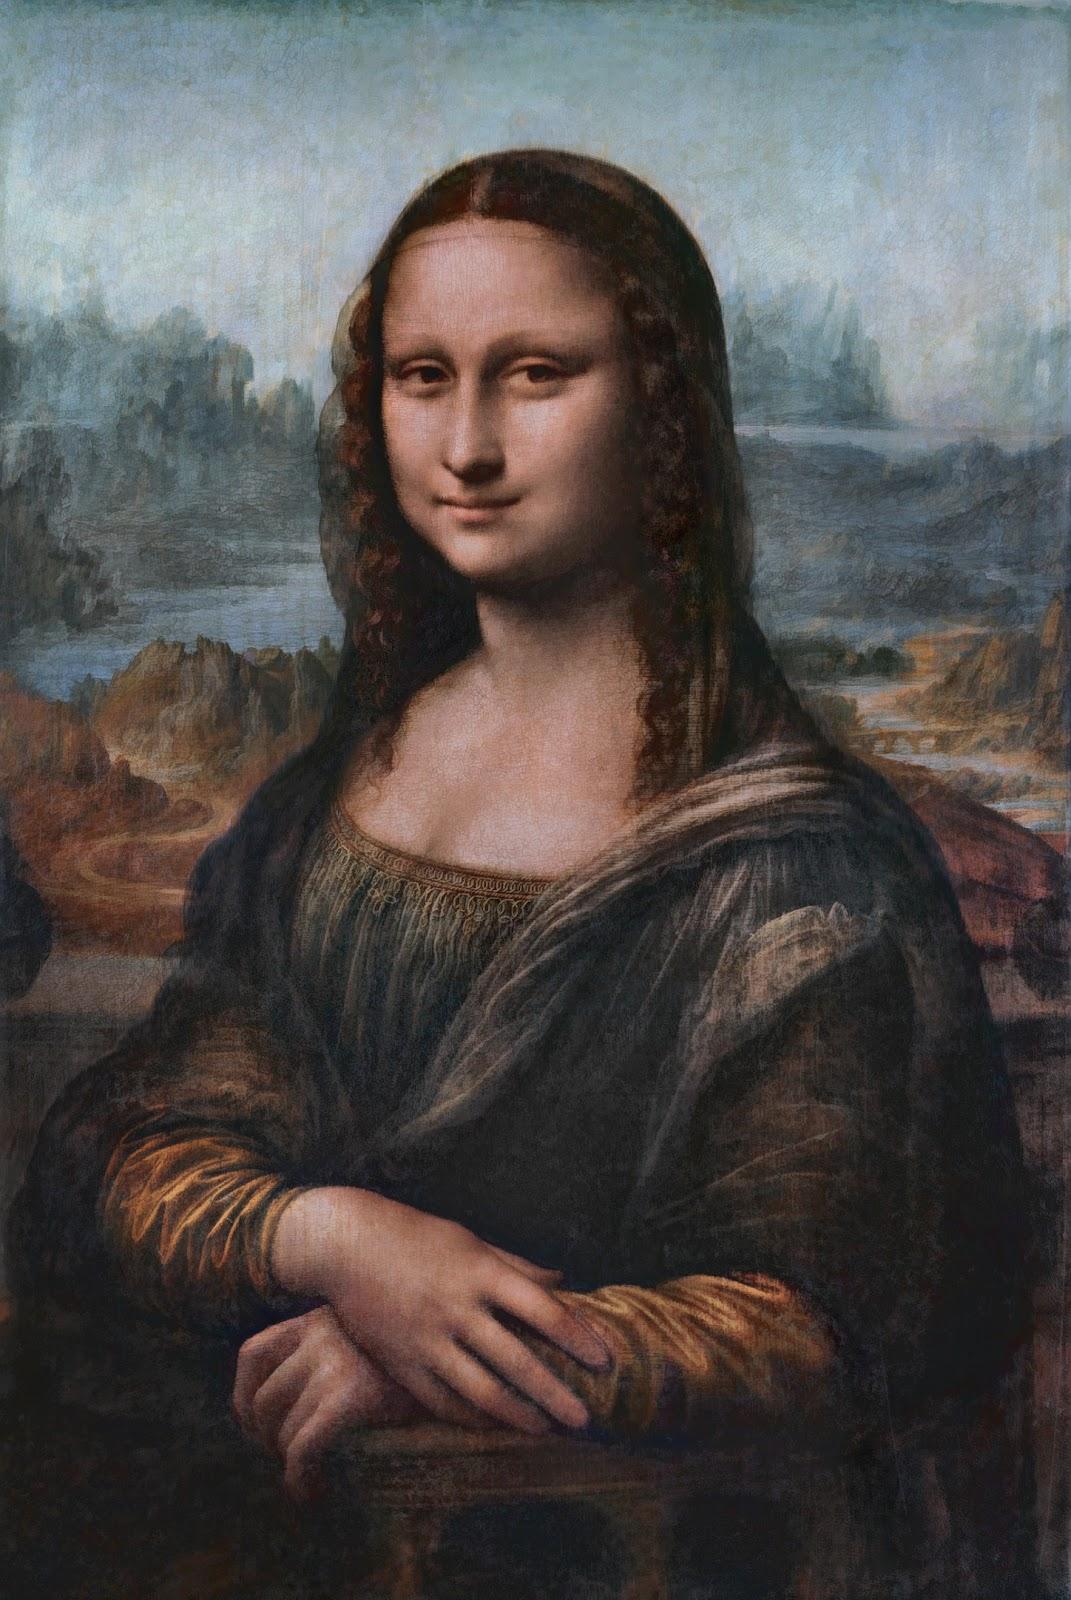 Leonardo da Vinci | Mona Lisa, Portrait of Lisa Gherardini ... Da Vinci Mona Lisa